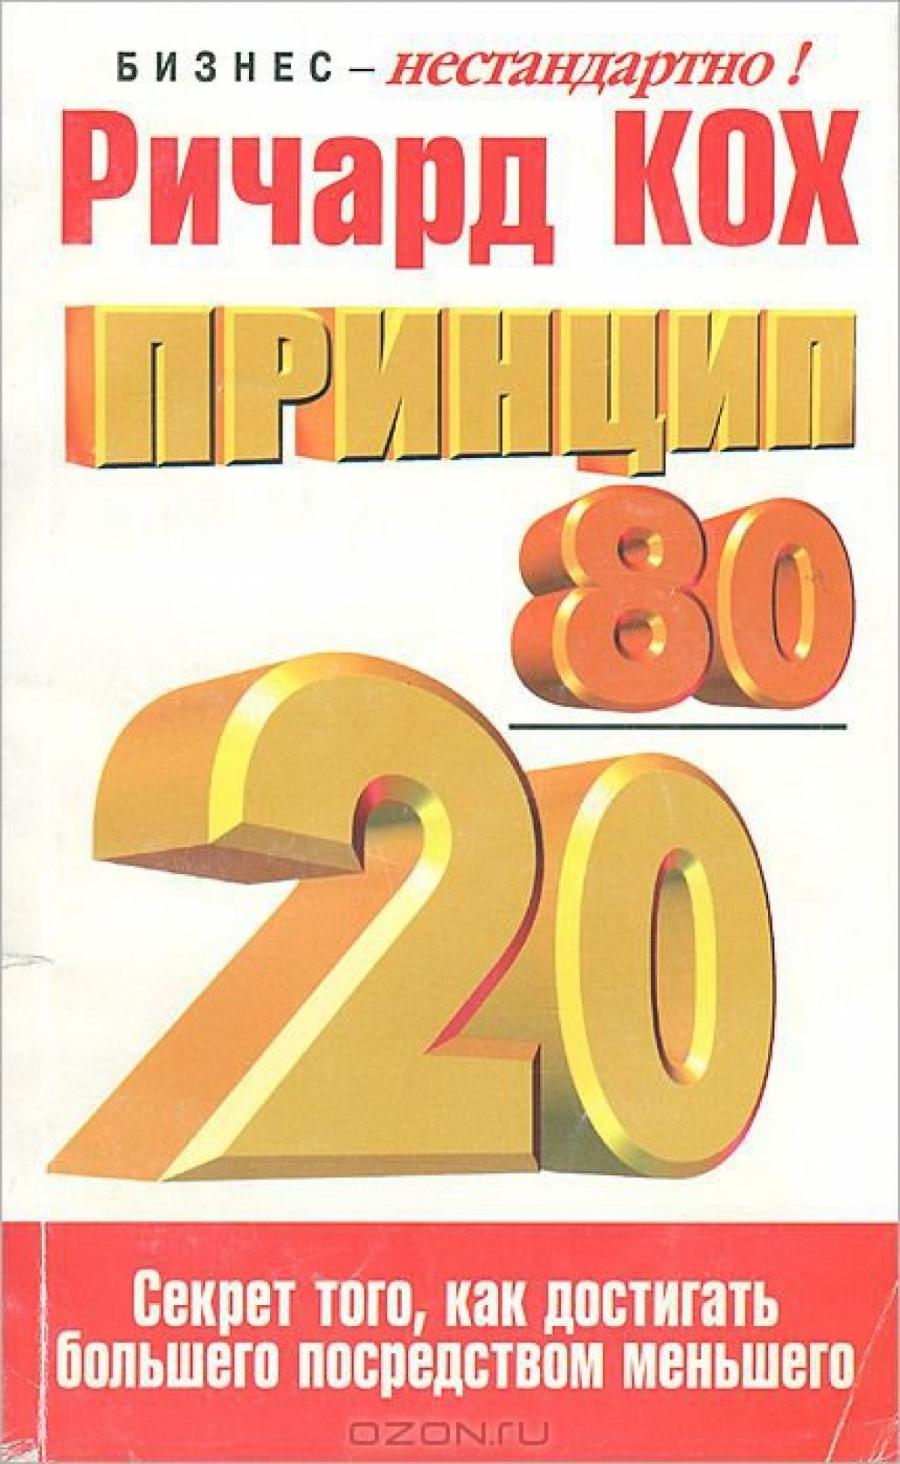 Обложка книги:  ричард кох - принцип 80-20